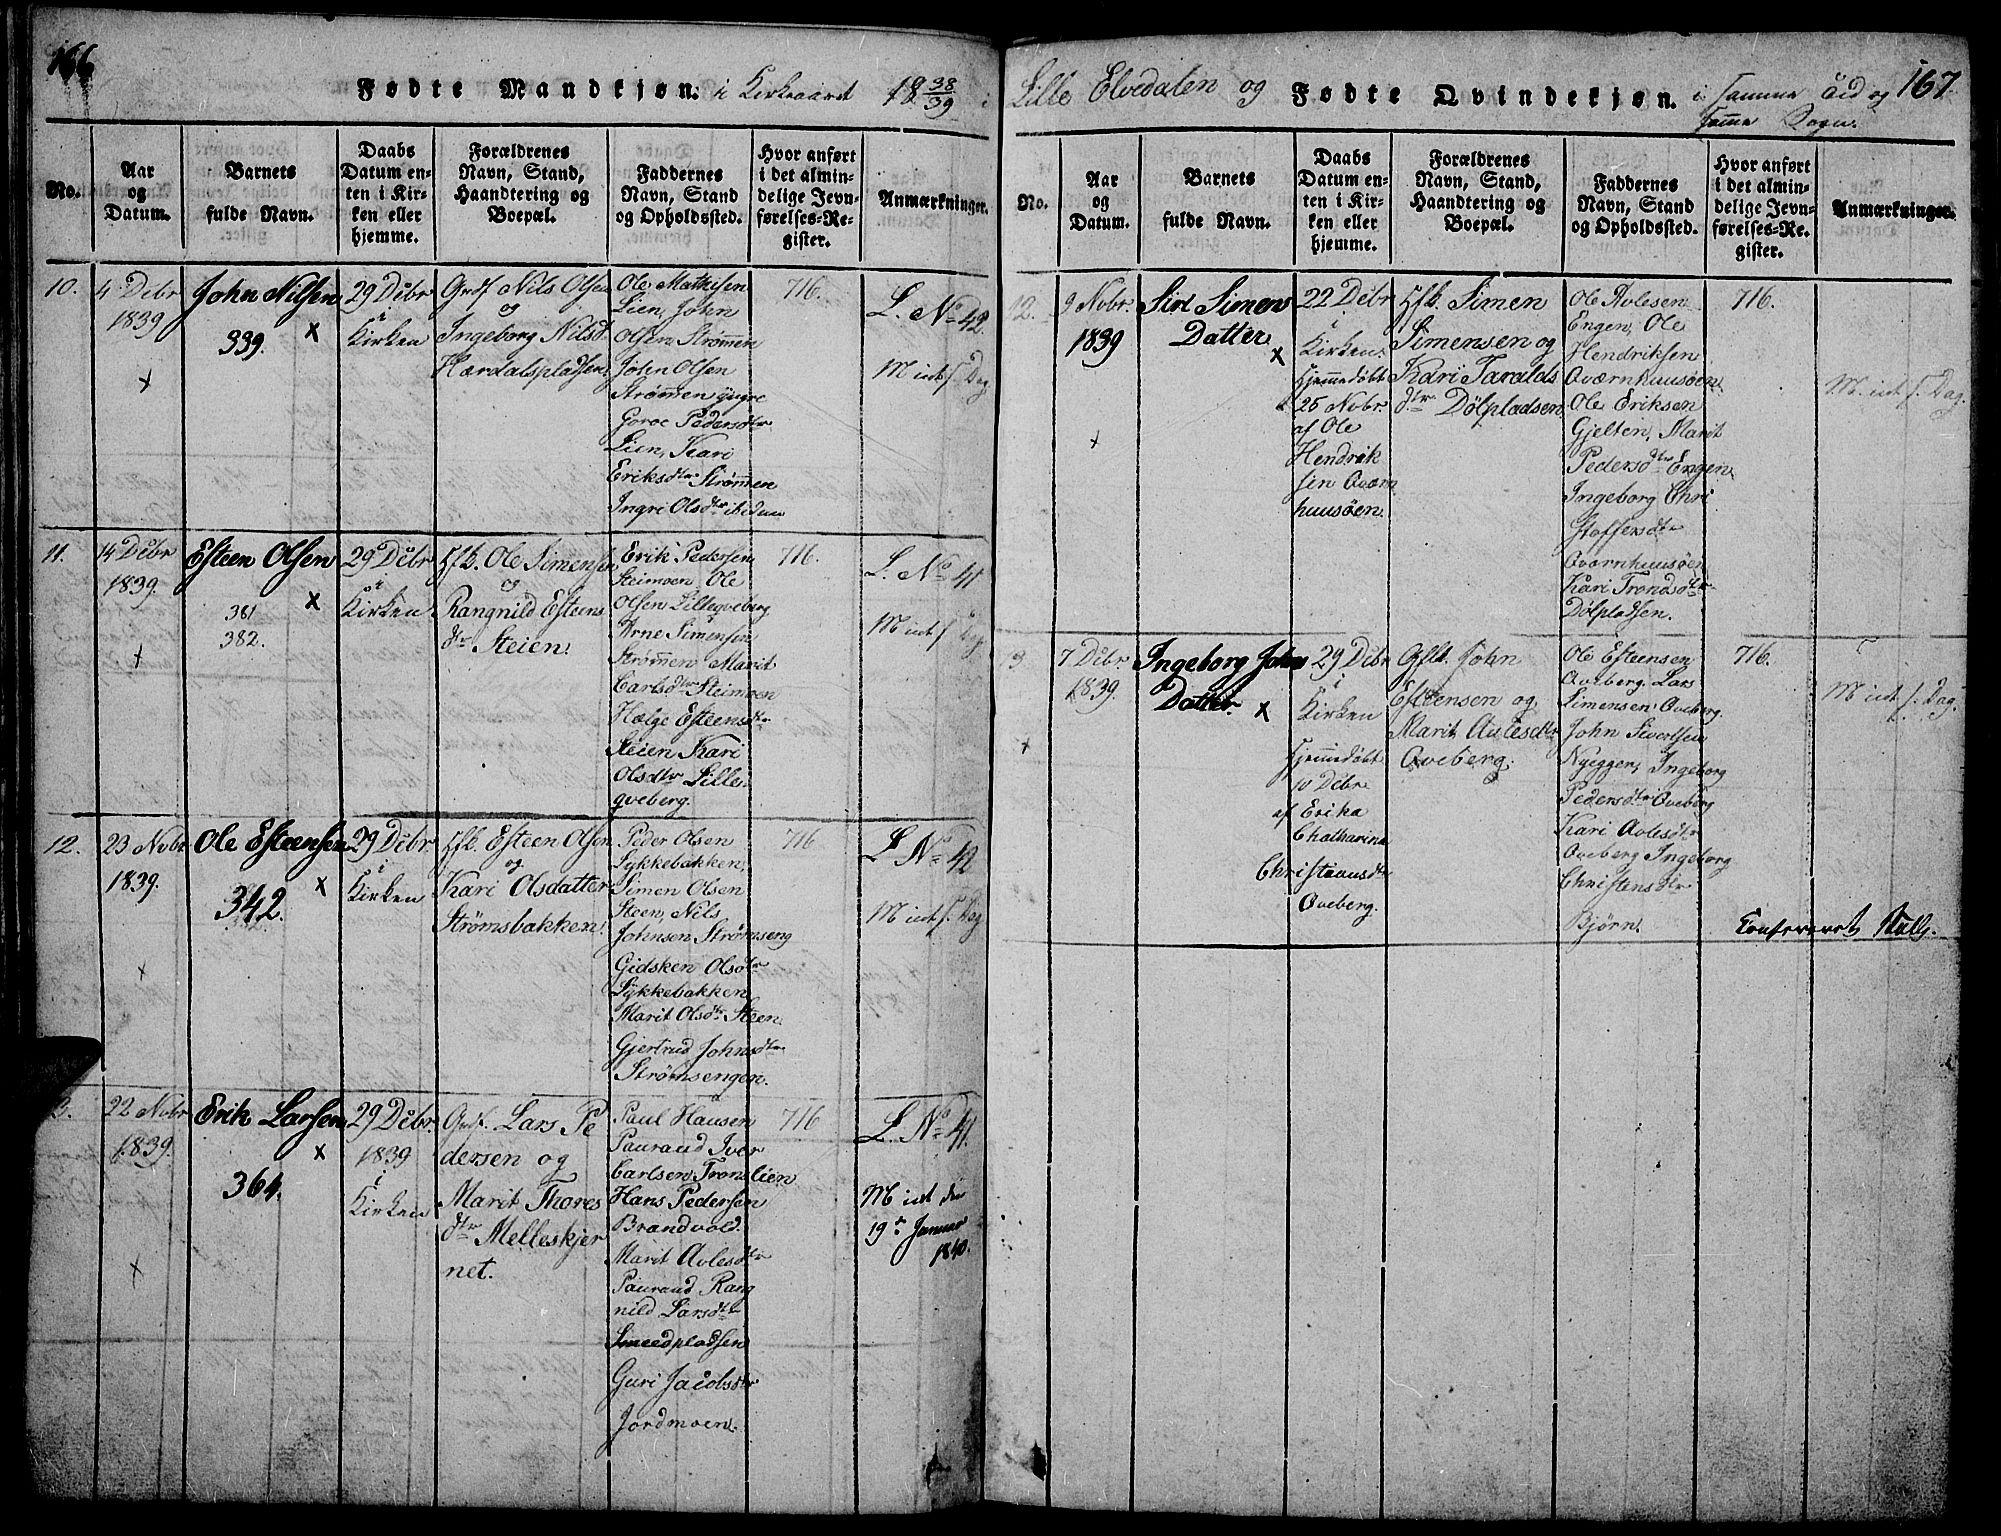 SAH, Tynset prestekontor, Klokkerbok nr. 2, 1814-1862, s. 166-167